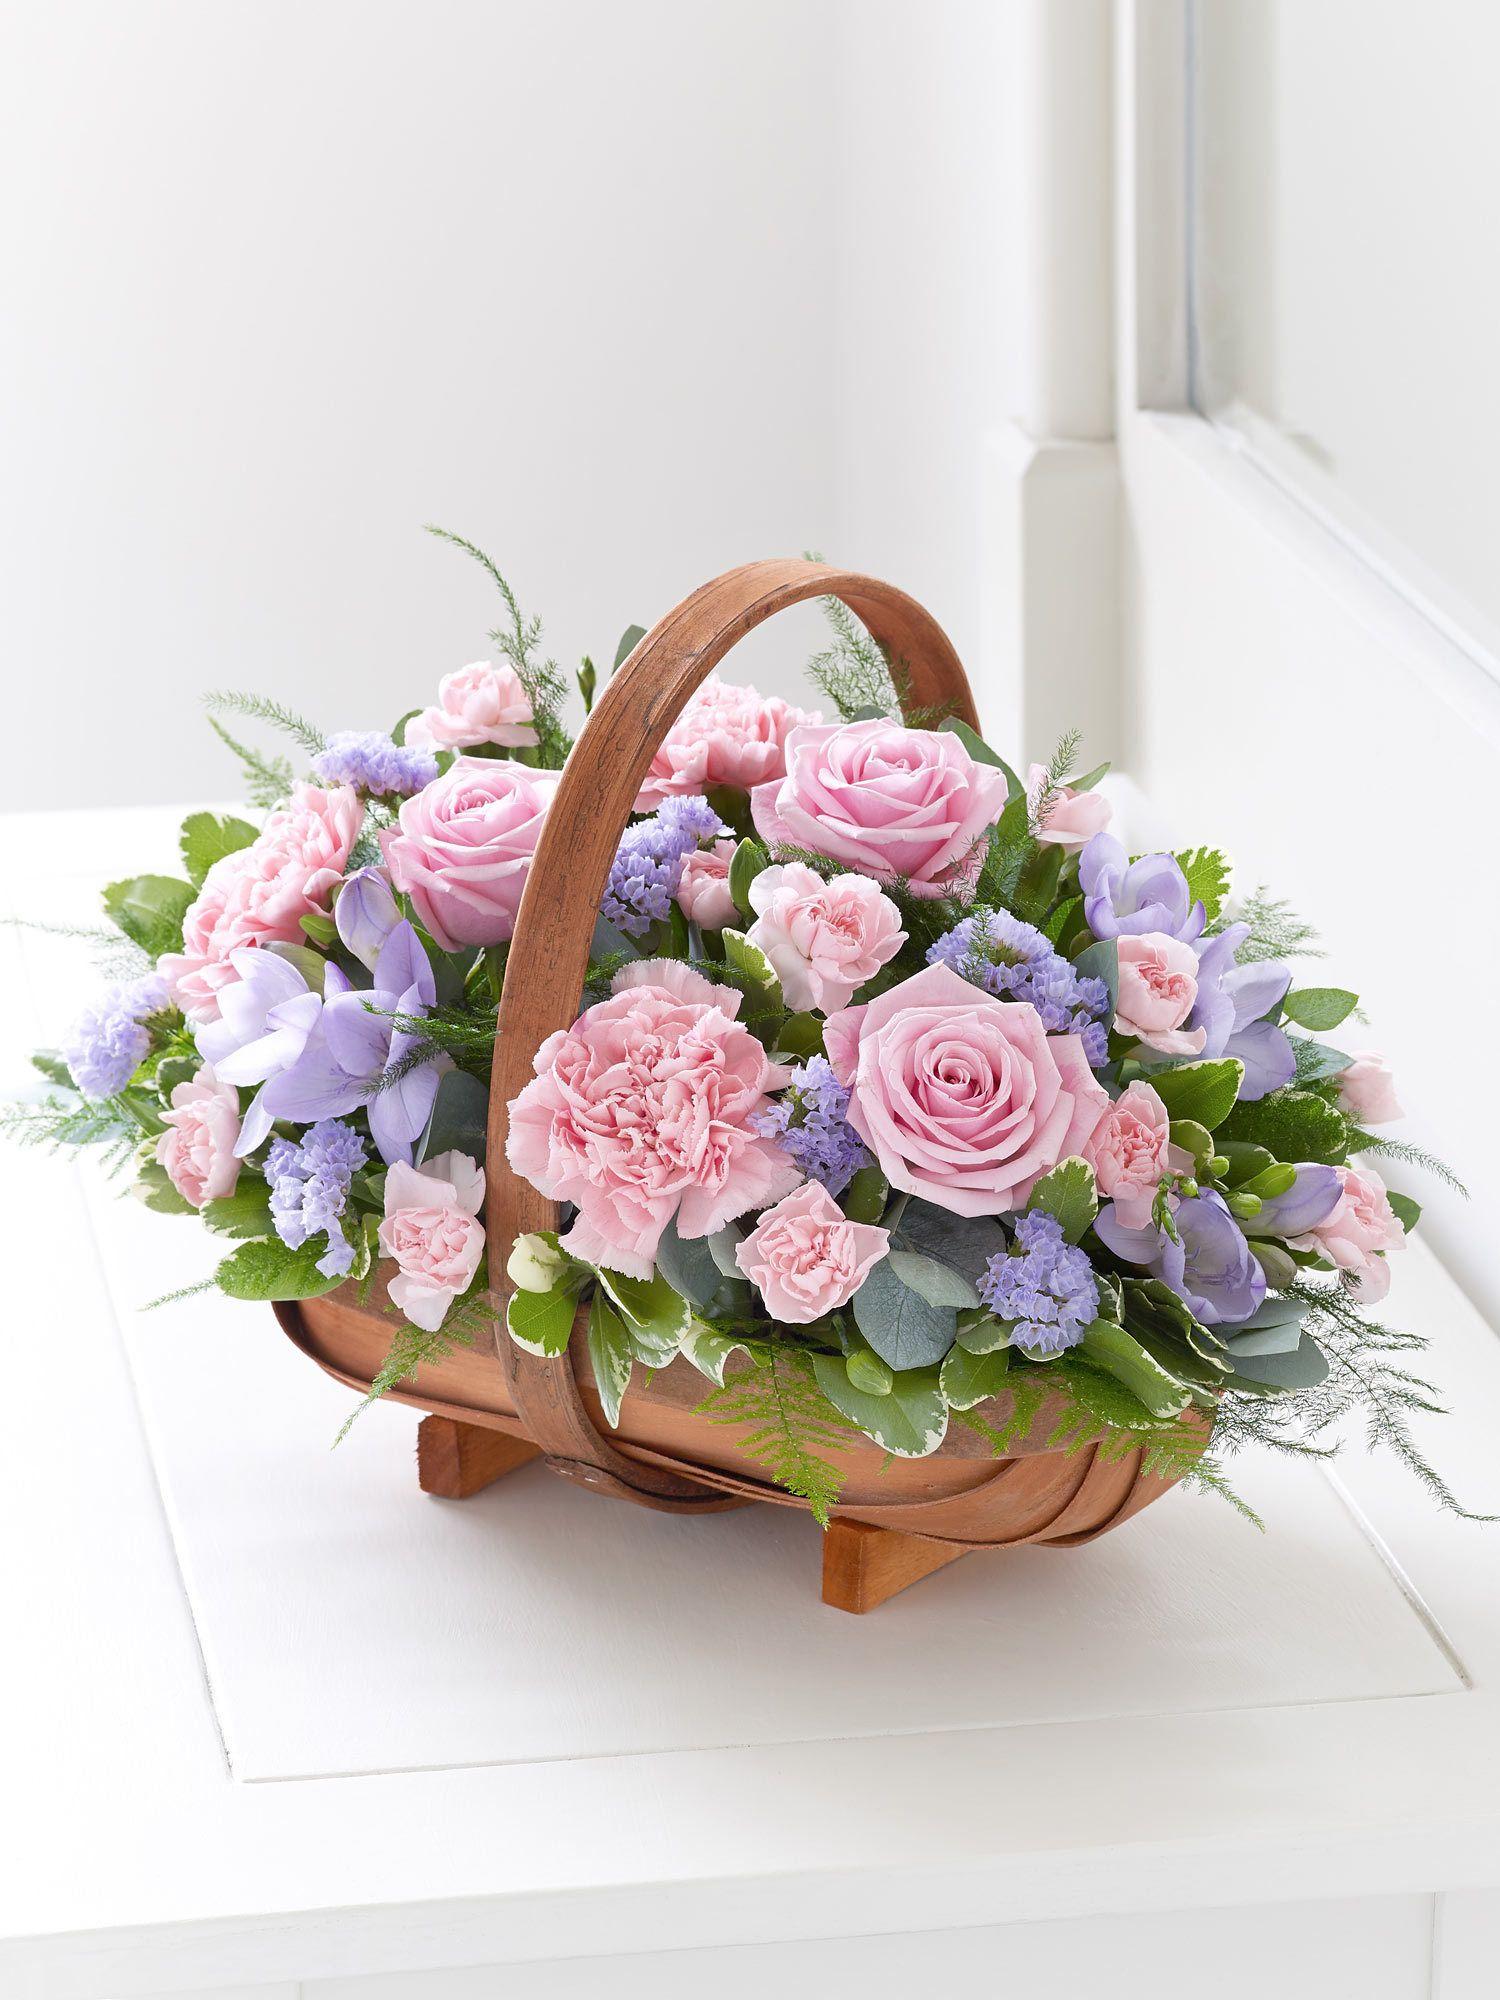 Mixed Basket Pink and Lilac Interflora Arreglos